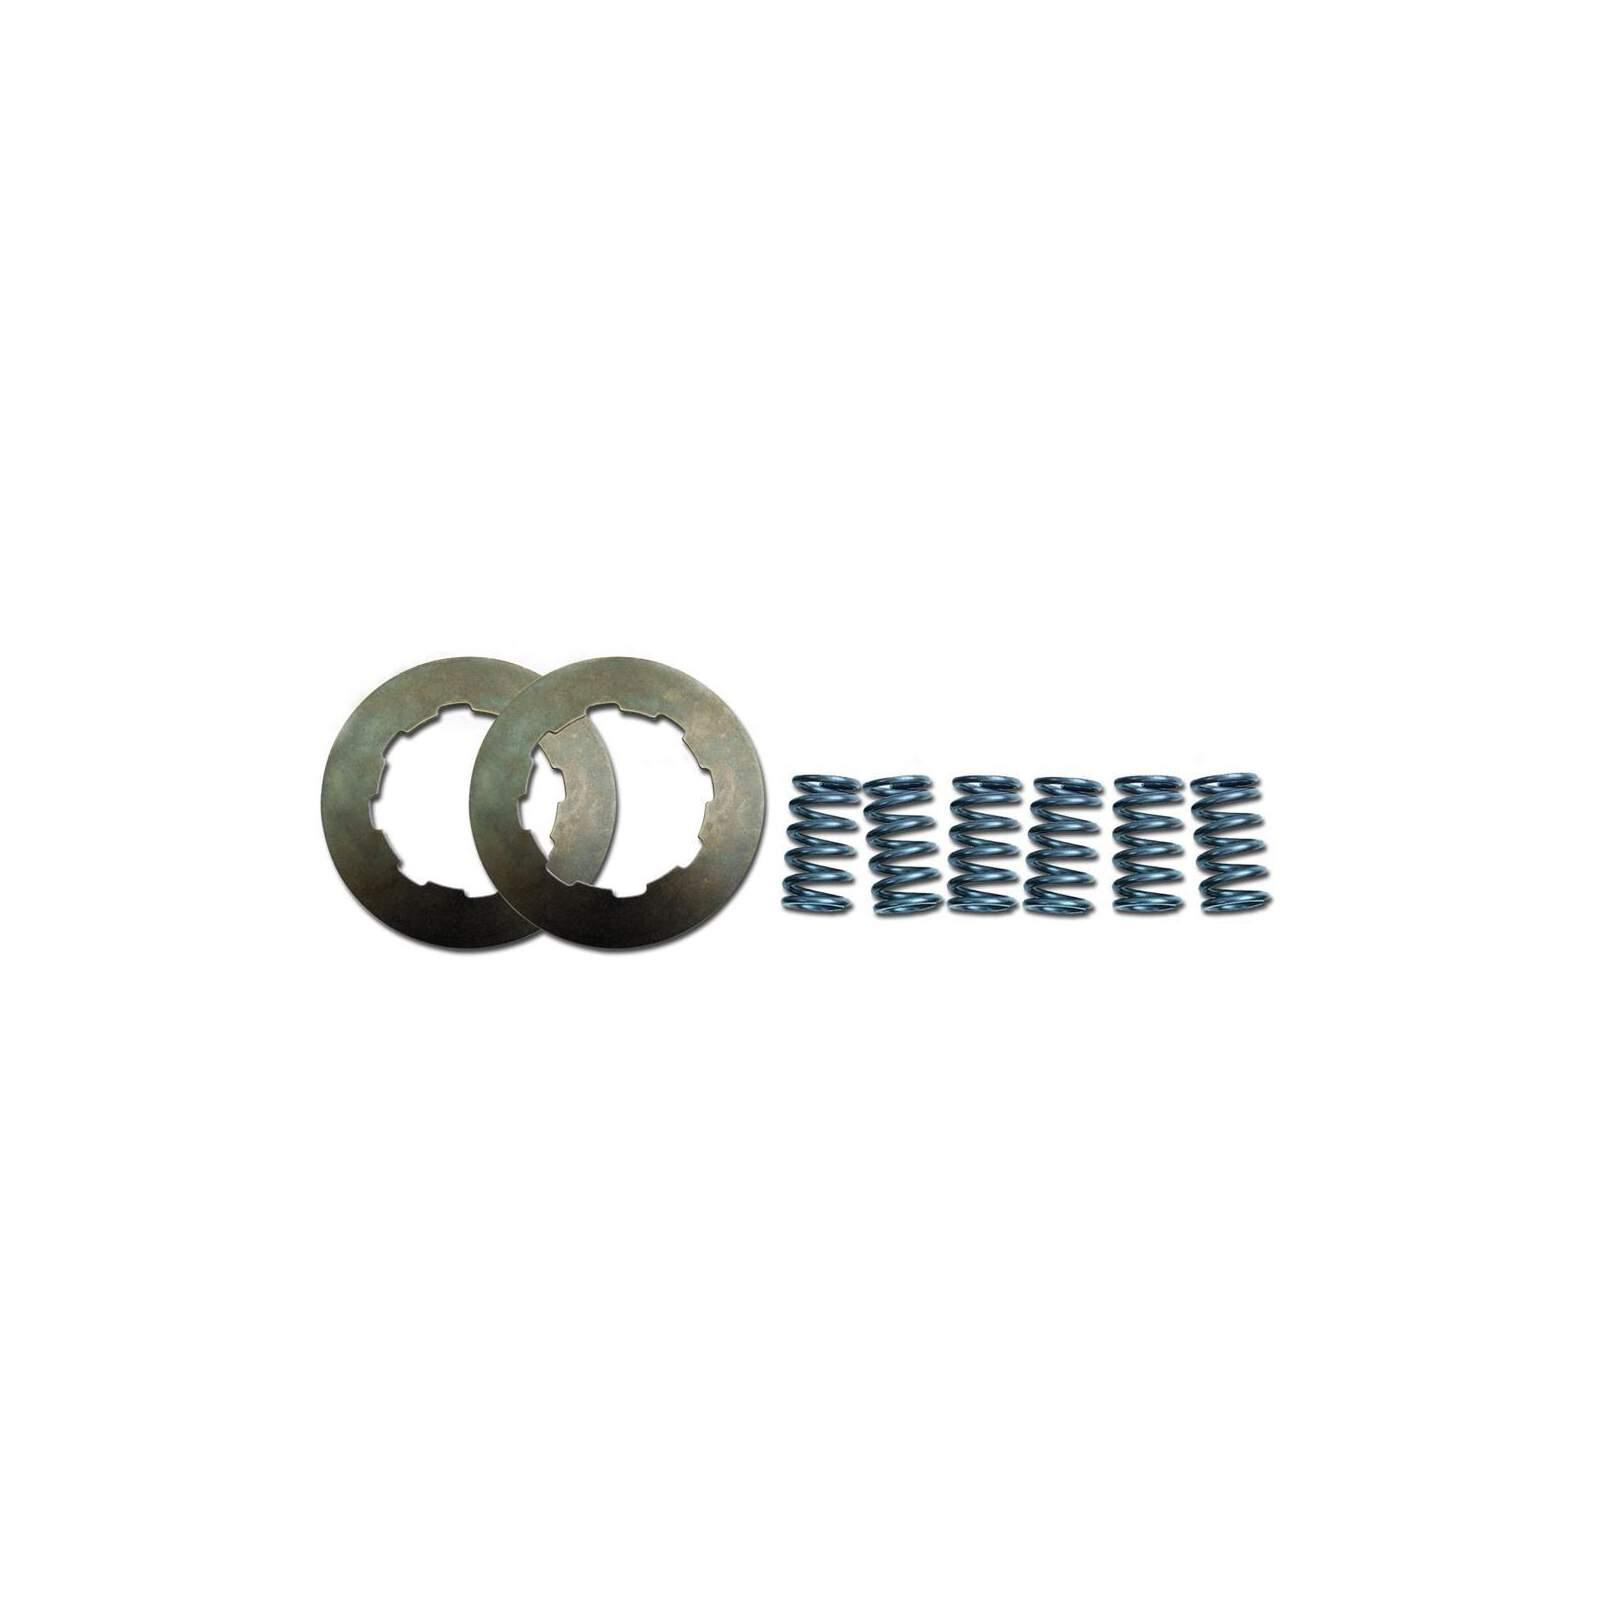 Double Spring Nut For Head Cap Screws Opel Astra Range Pack of 20 Part 485op